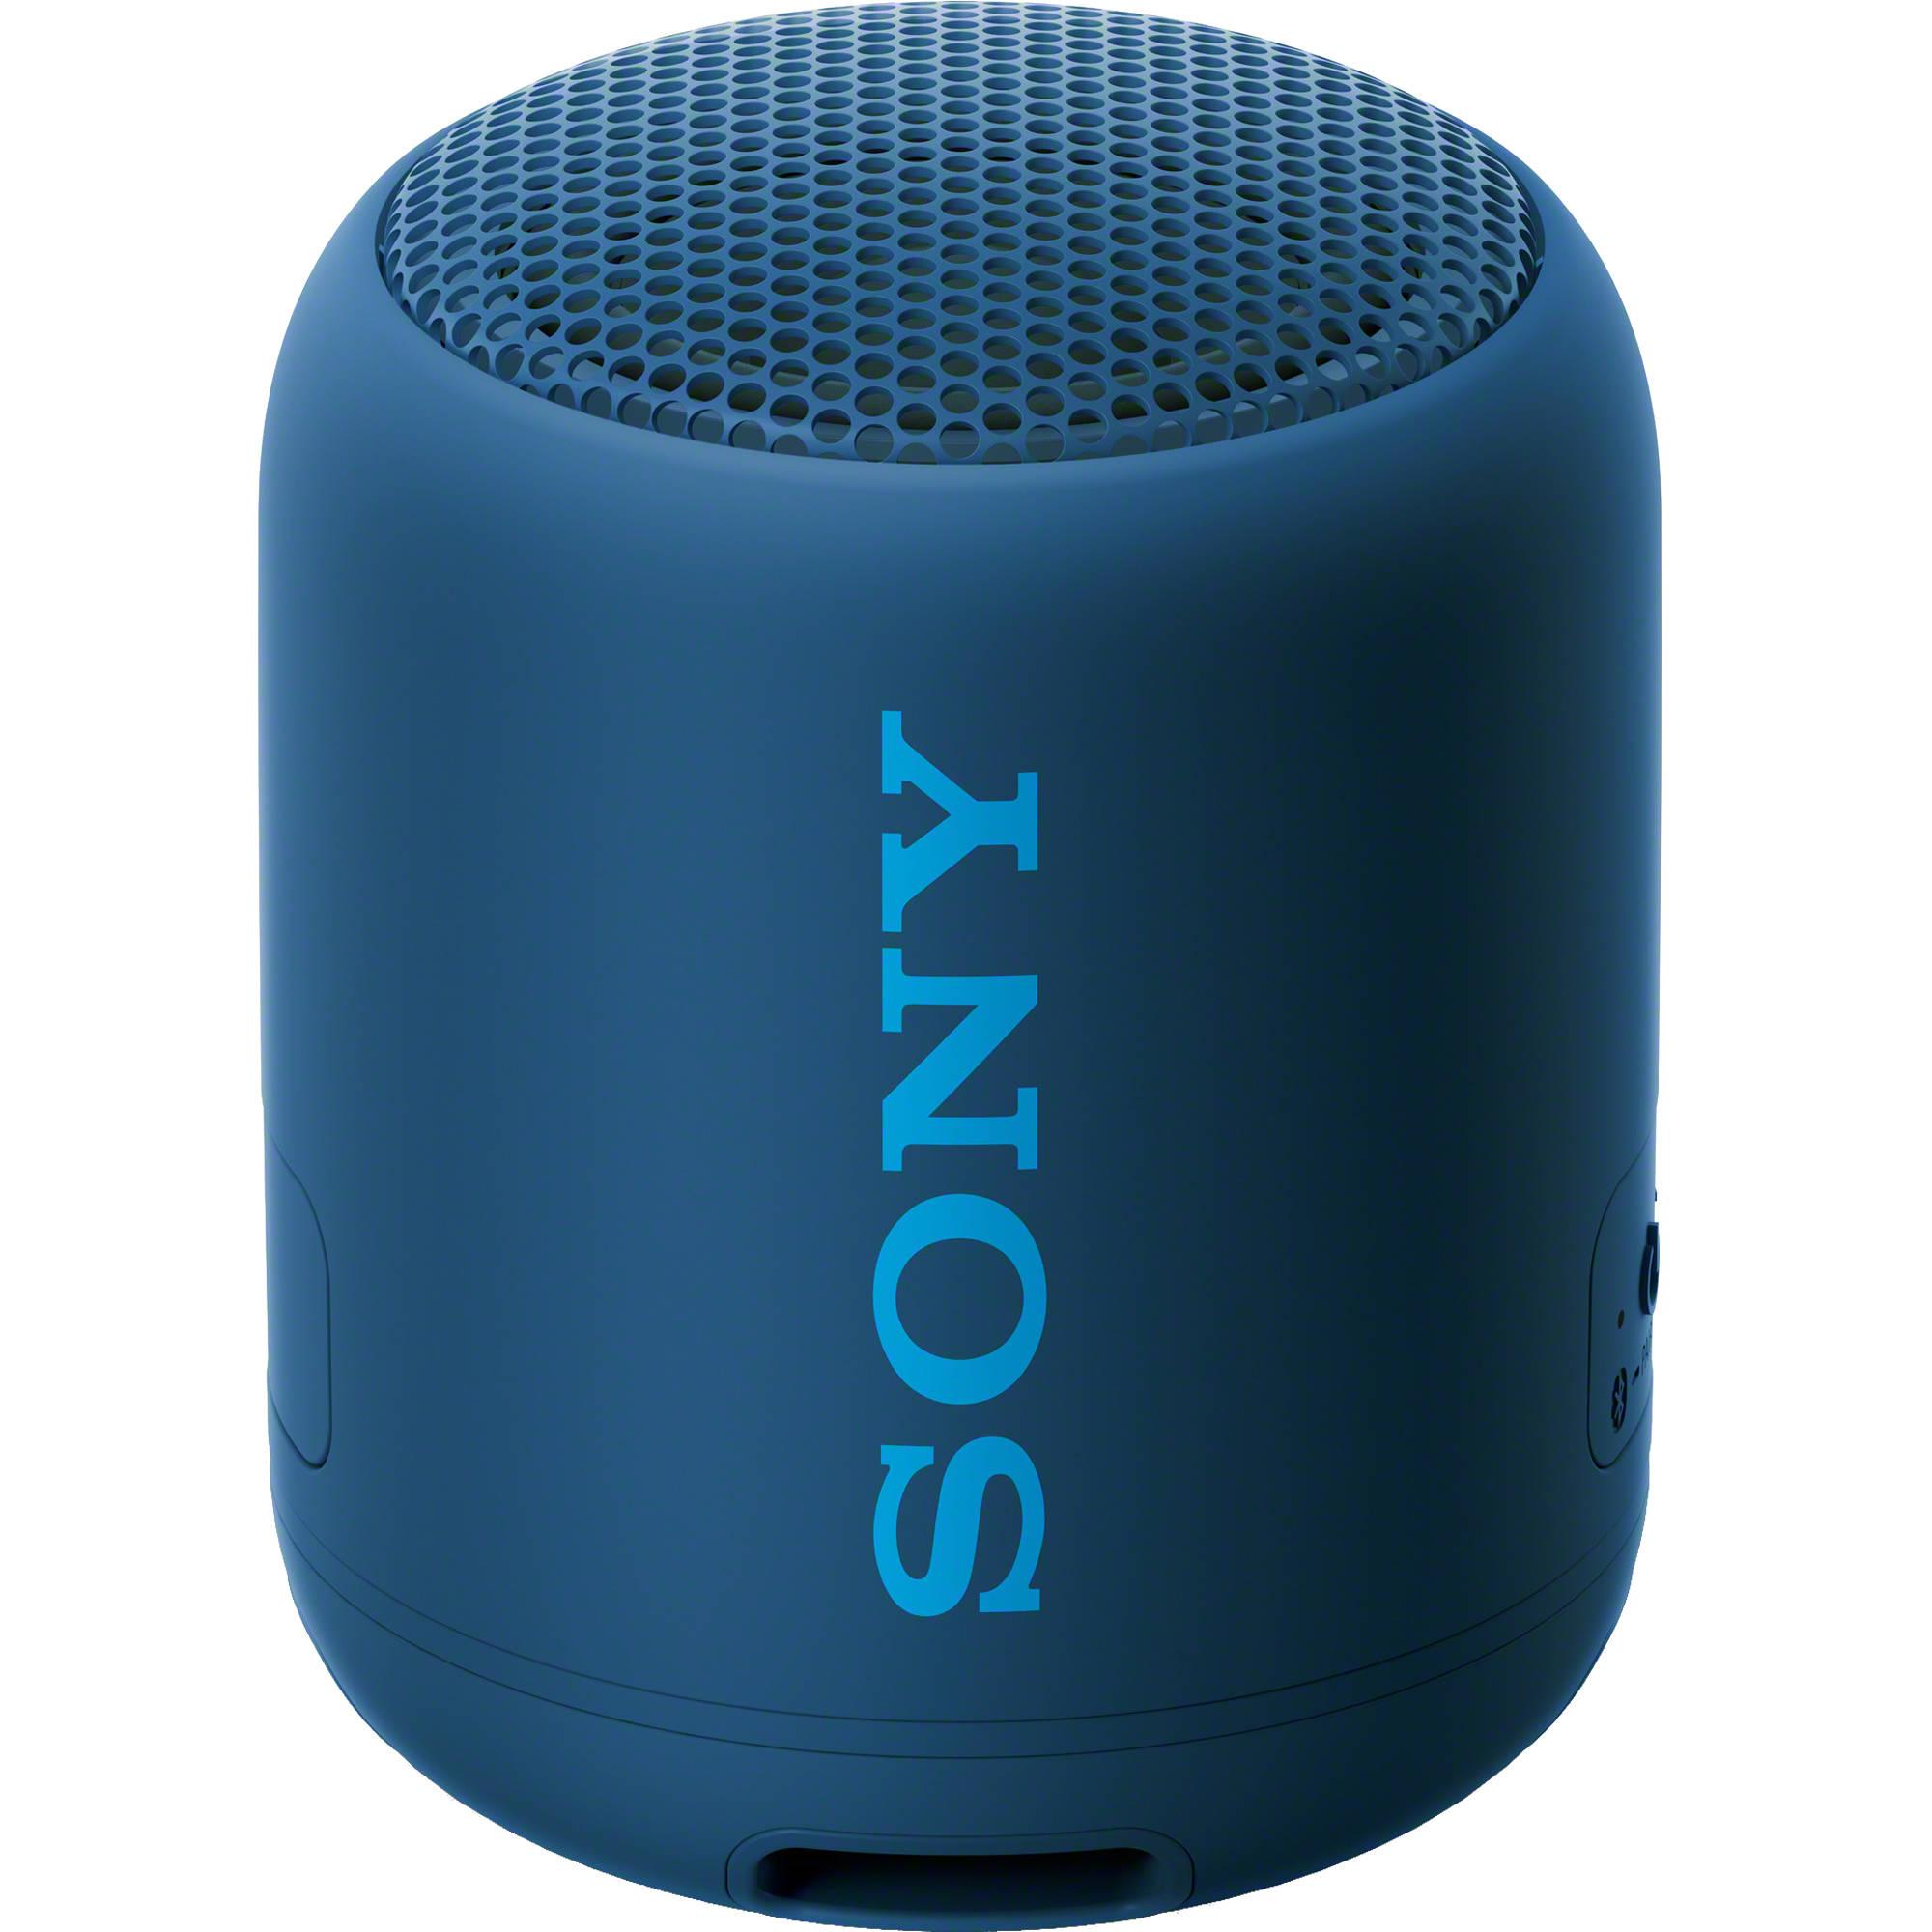 Sony Srs Xb12 Portable Bluetooth Speaker Blue Srsxb12 Lz B H